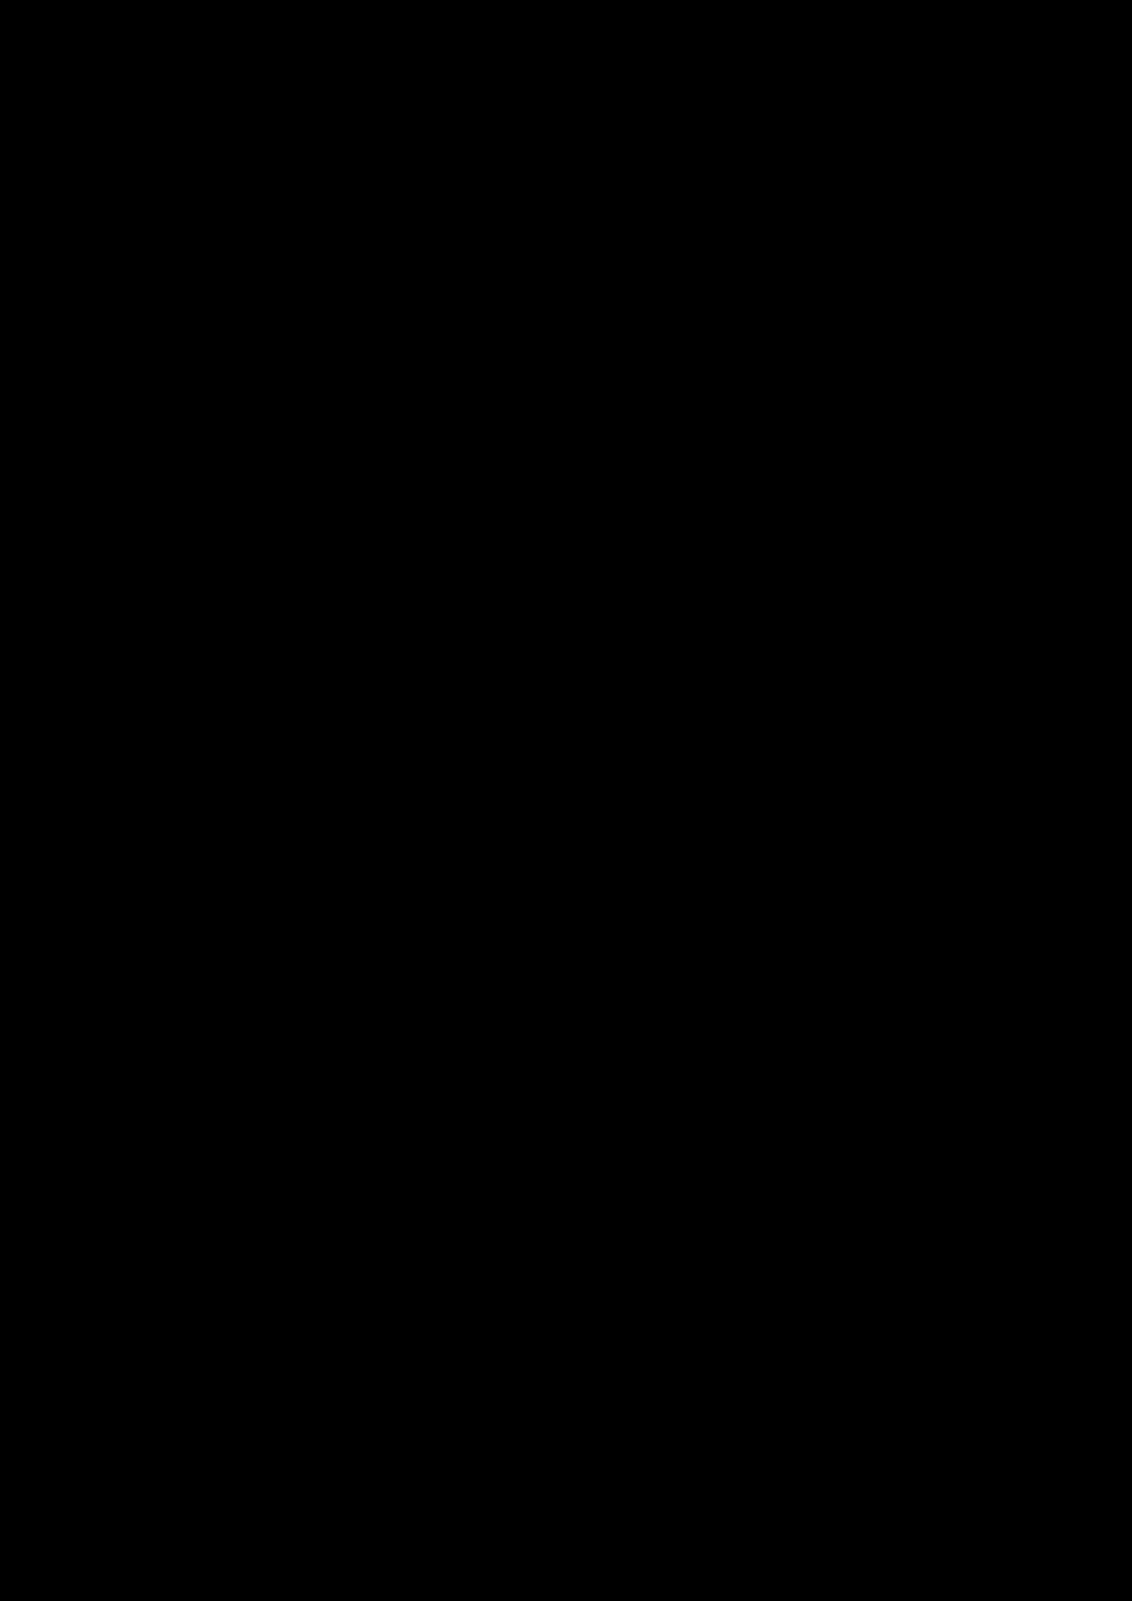 Ten lyubvi slide, Image 10